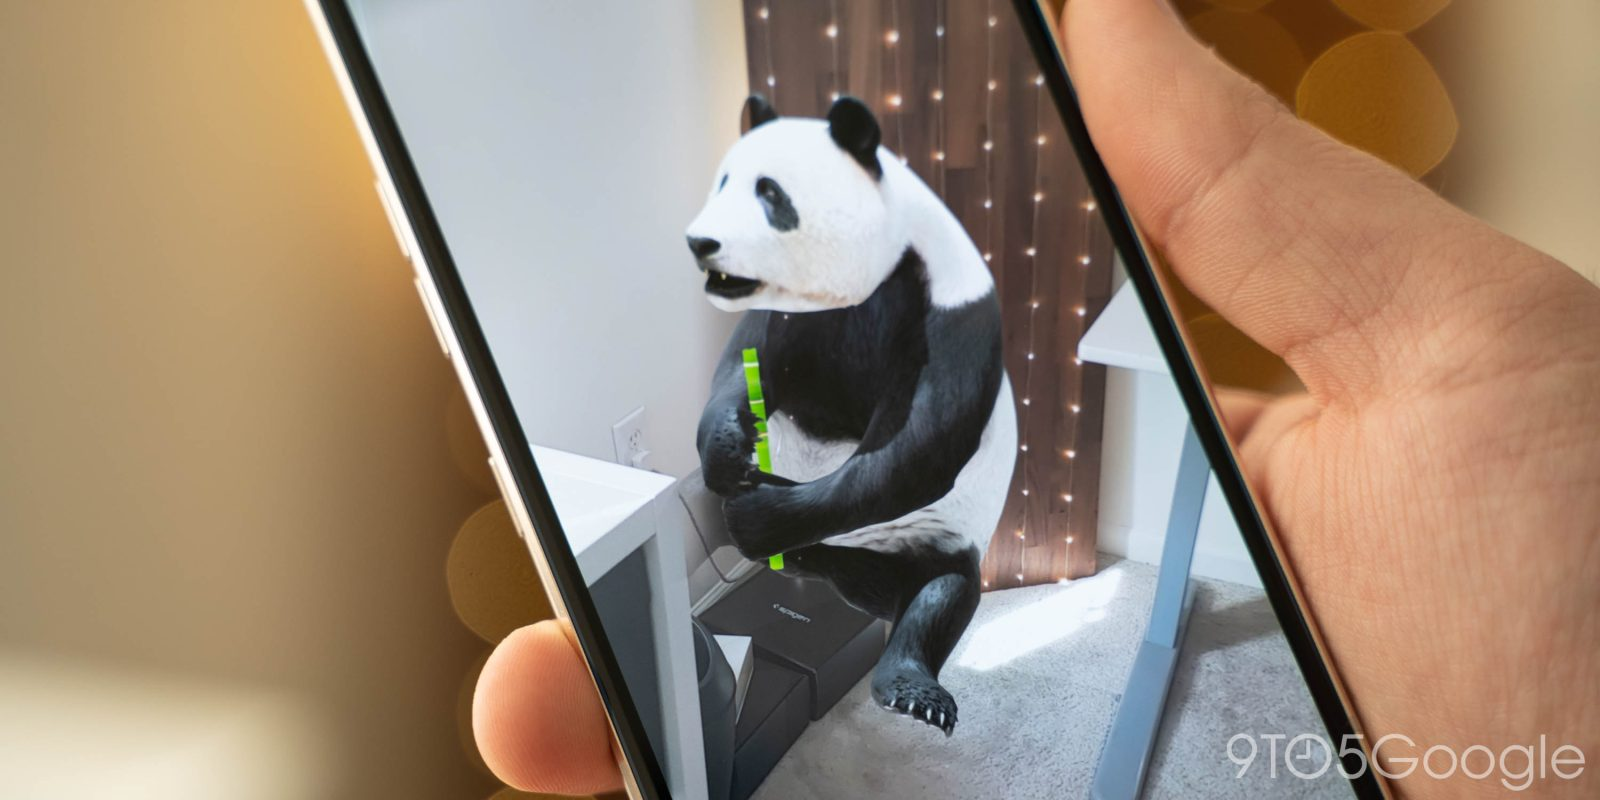 Google S 3d Animals Are The Perfect Quarantine Activity 9to5google